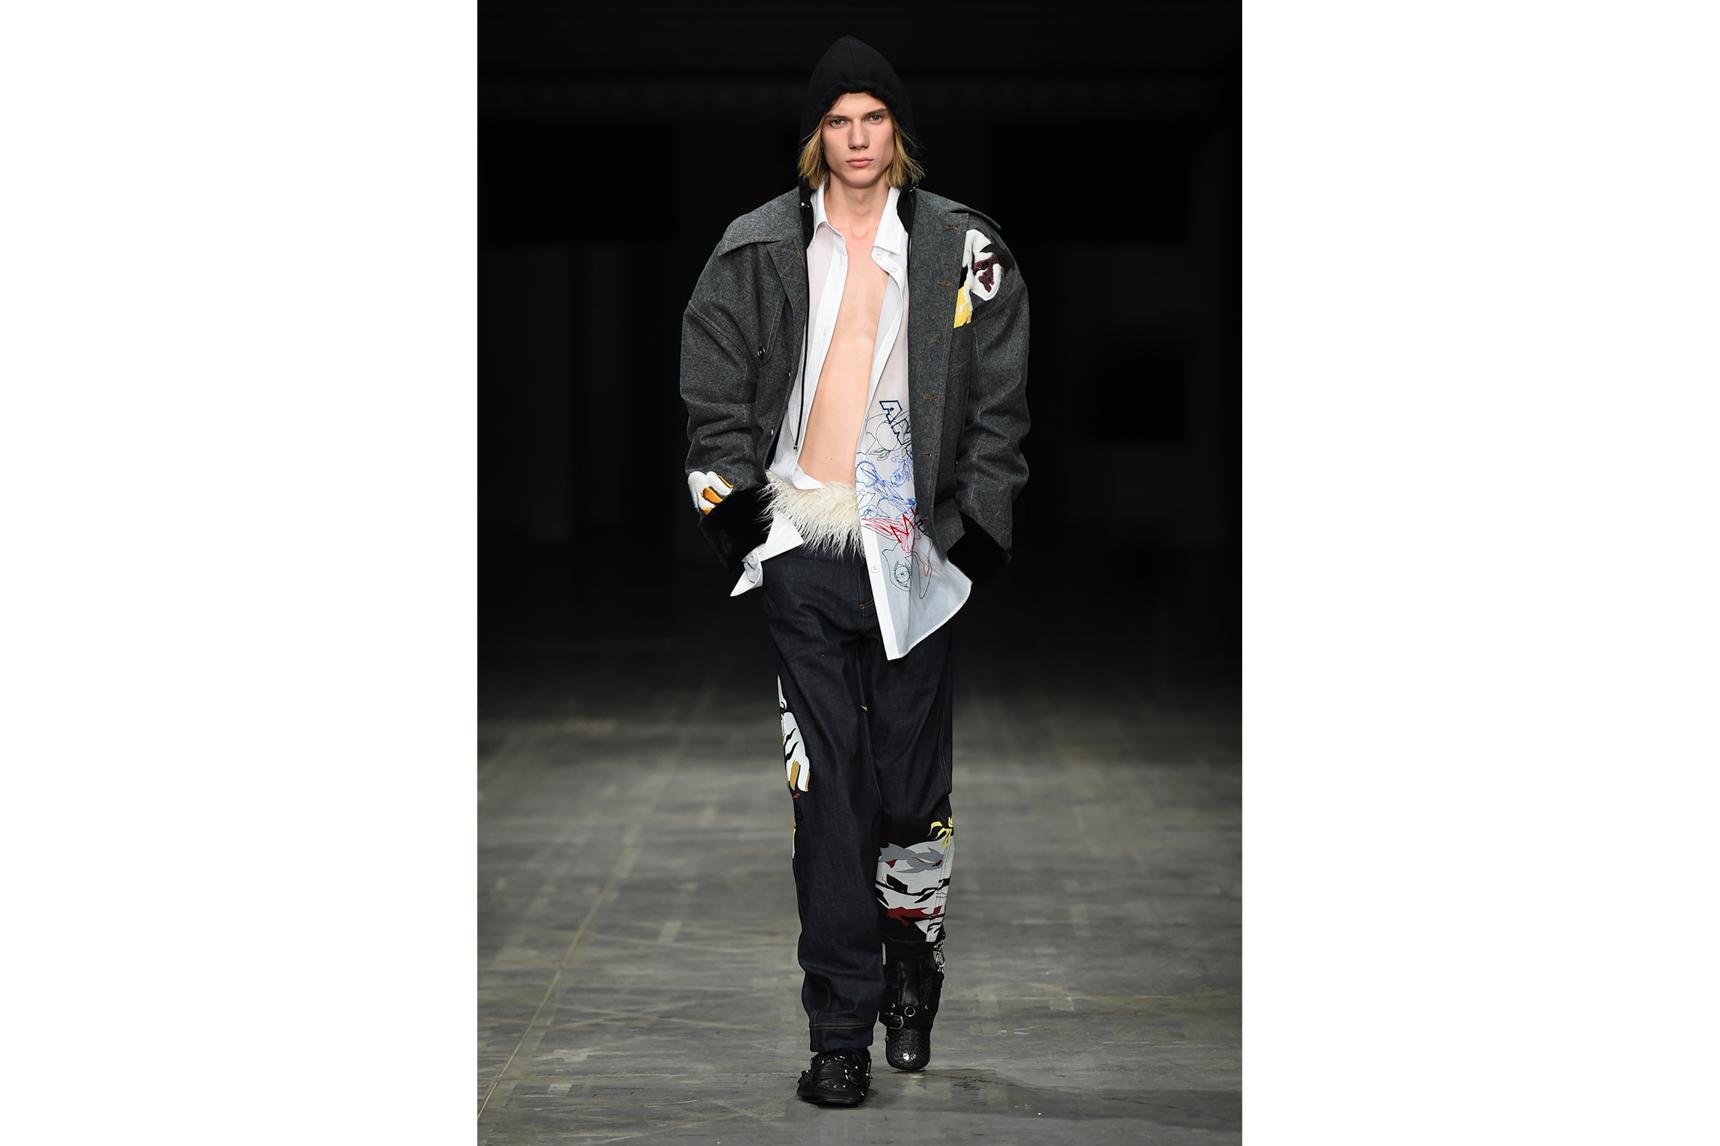 Angel Chen milano fashion show look 15-Edit.jpg